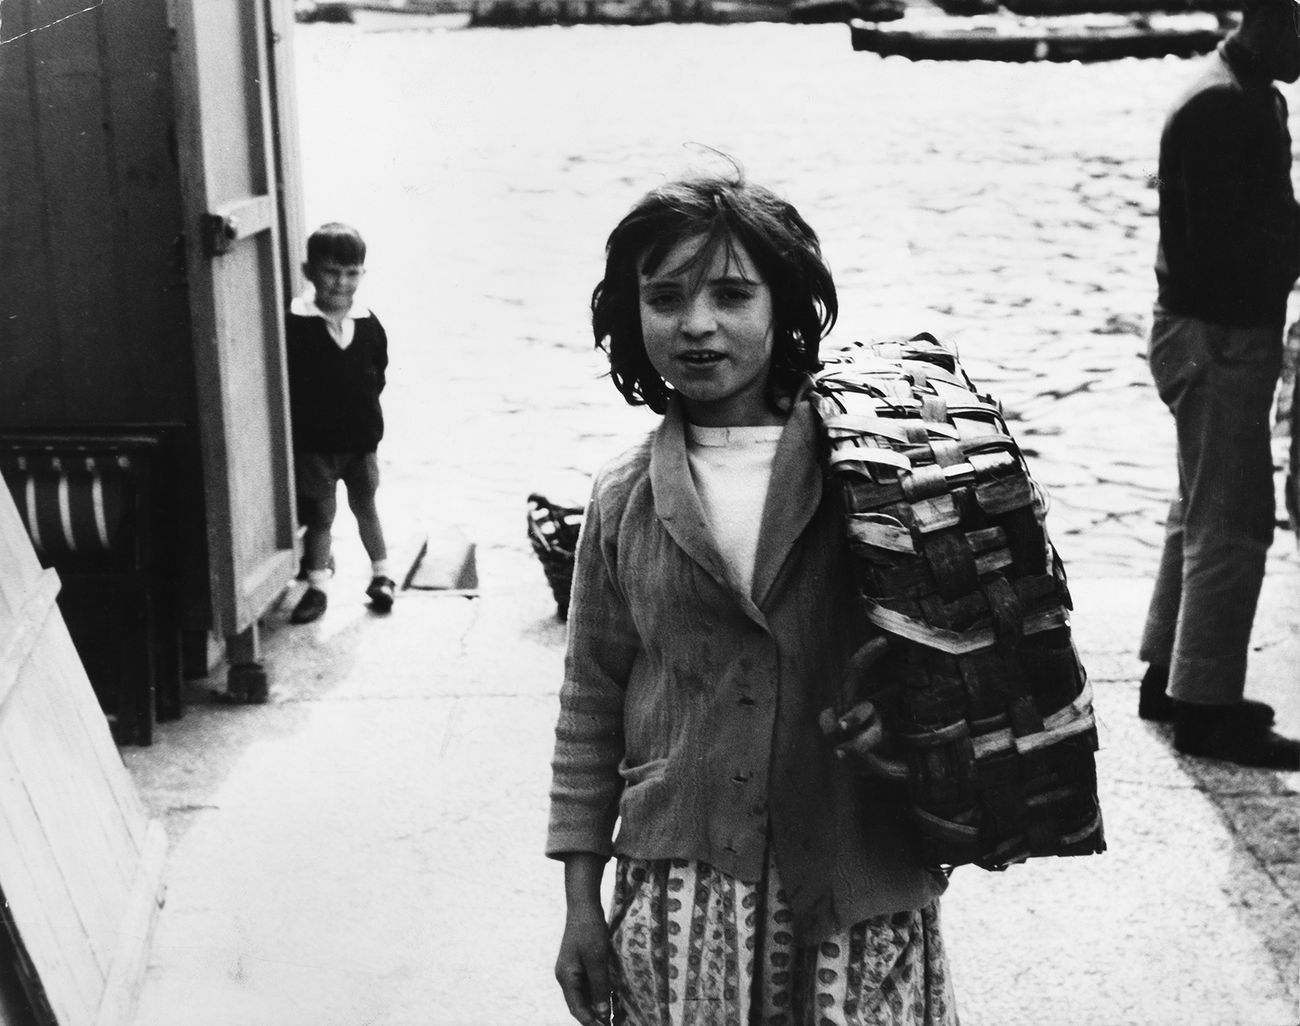 Pino Pascali, Bambina con valigia, 1965